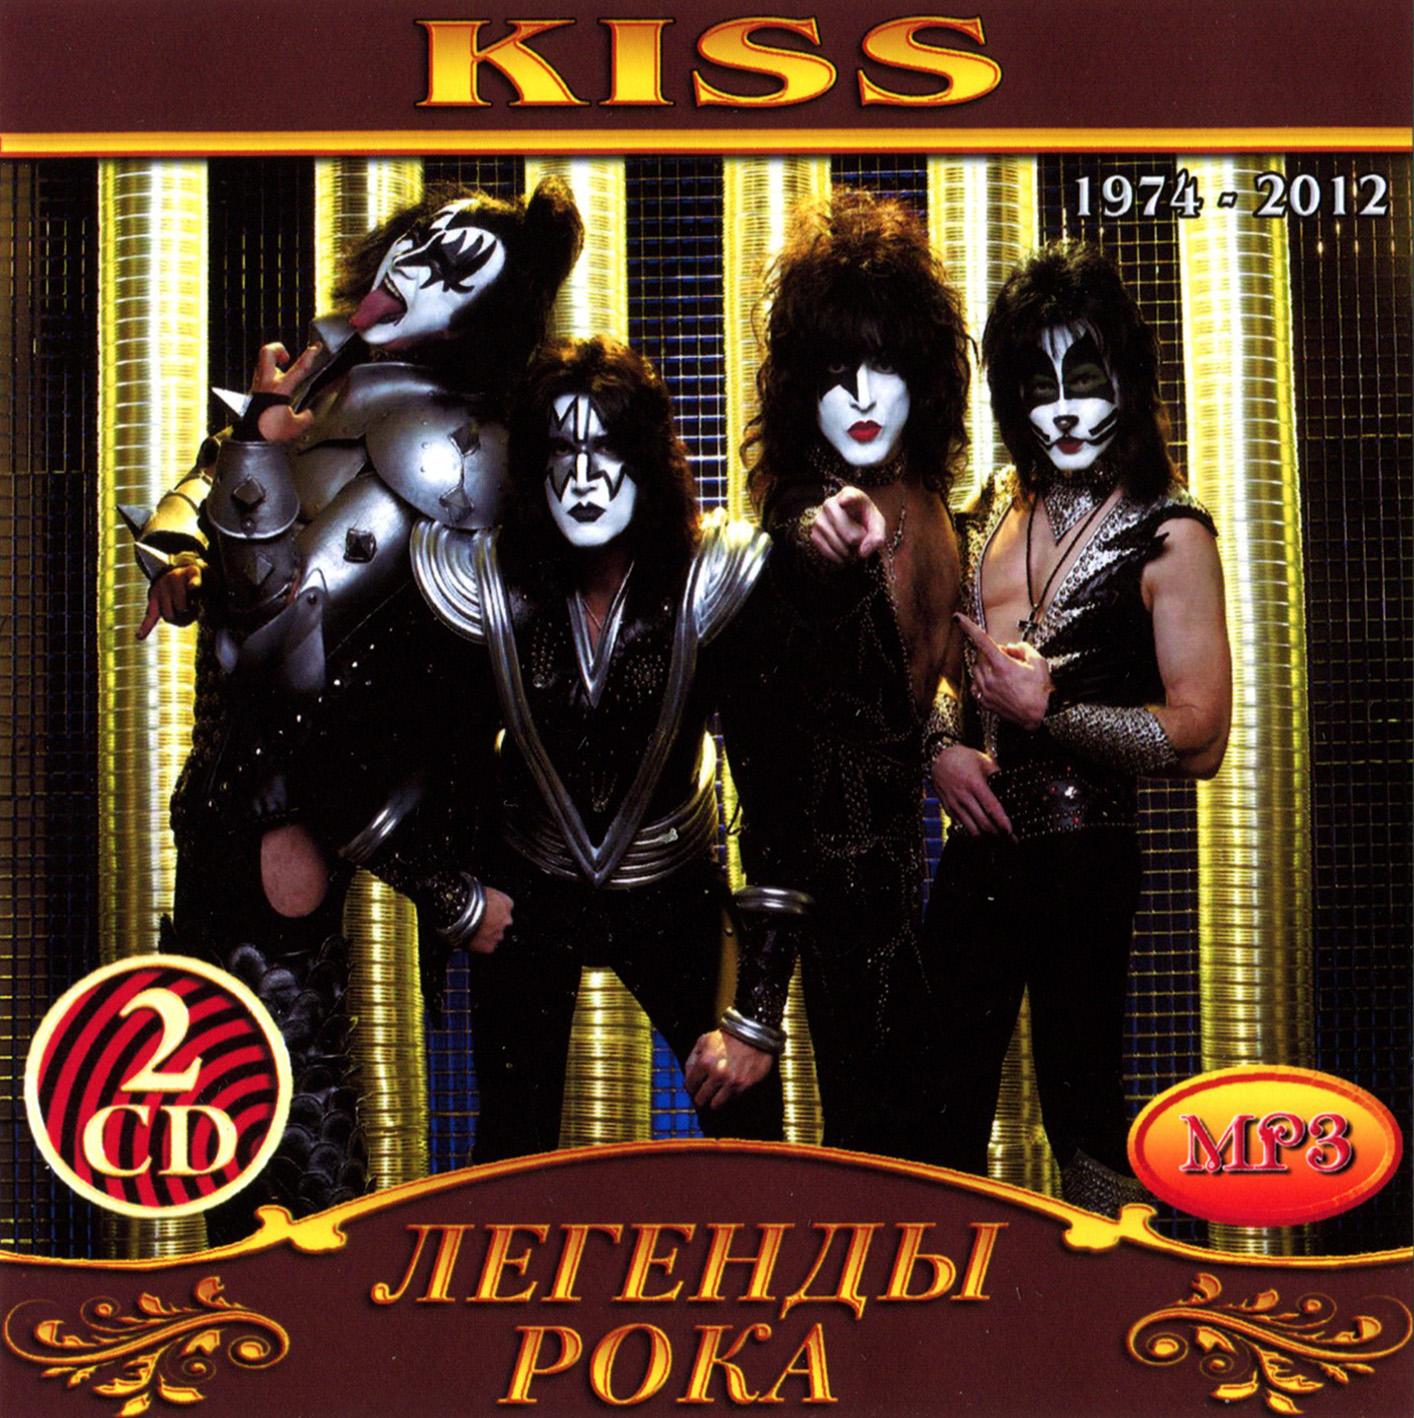 Kiss 2cd [mp3]